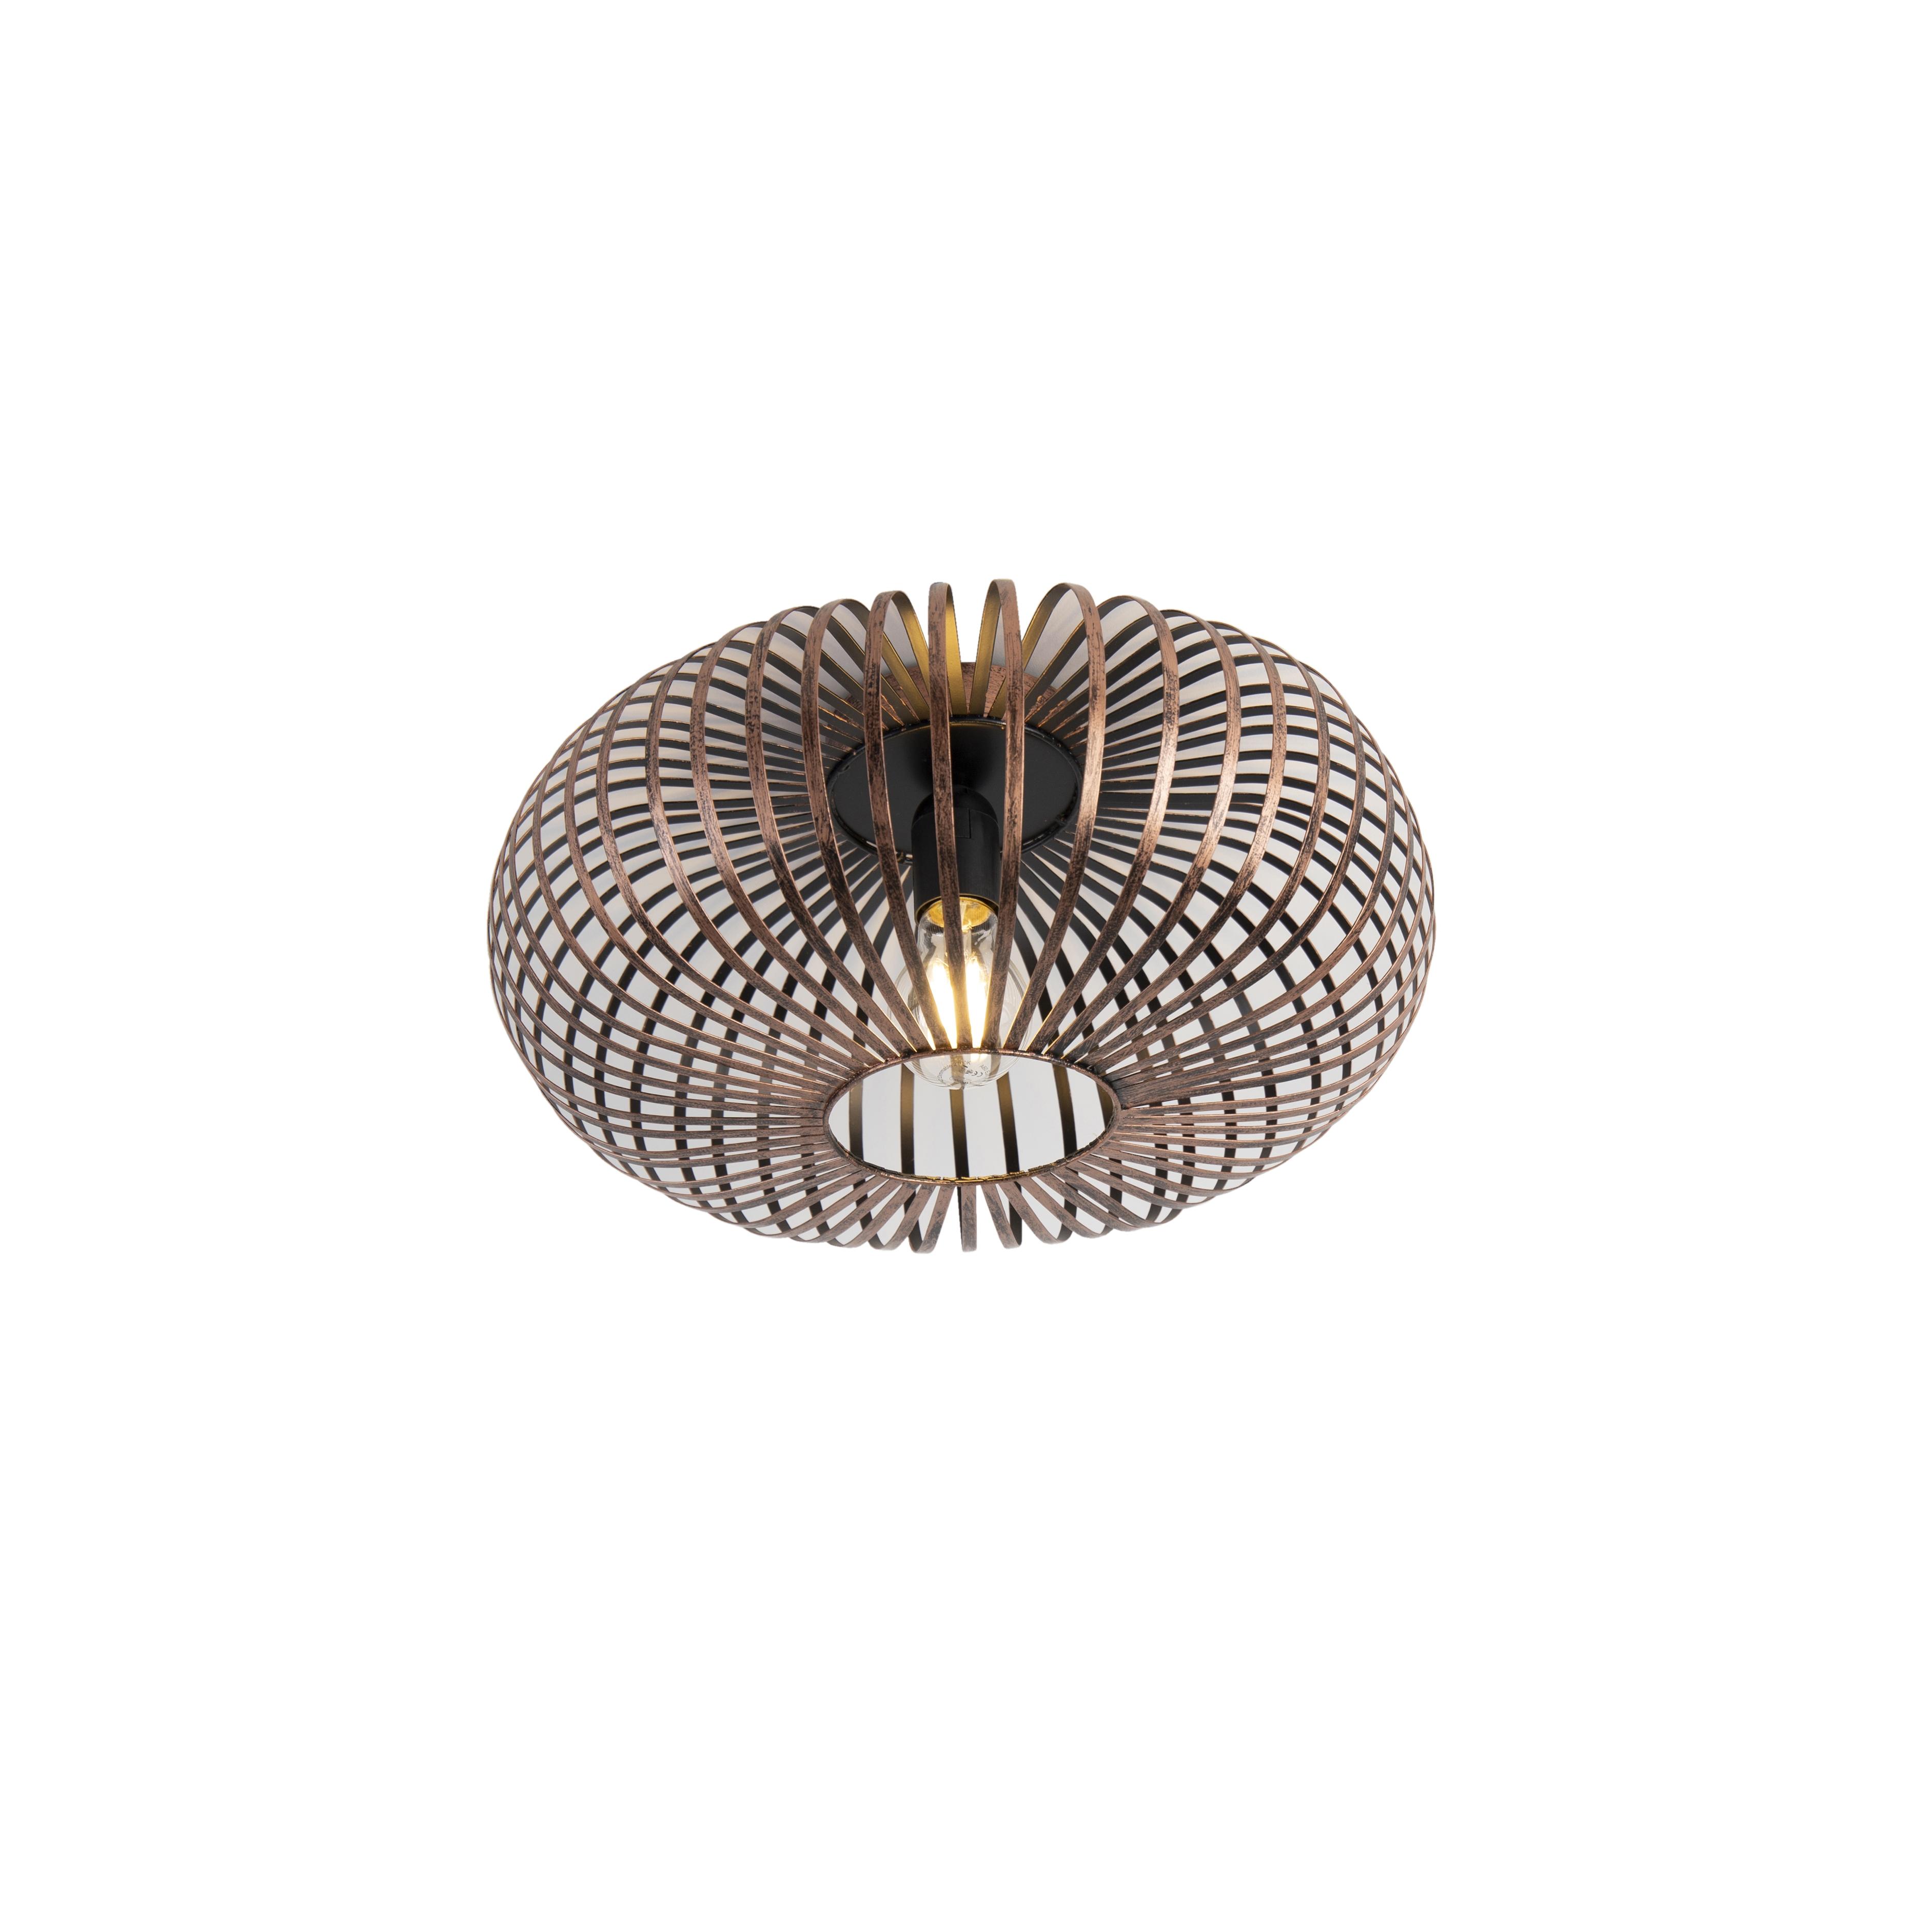 Industriele ronde plafondlamp roestbruin - Johanna